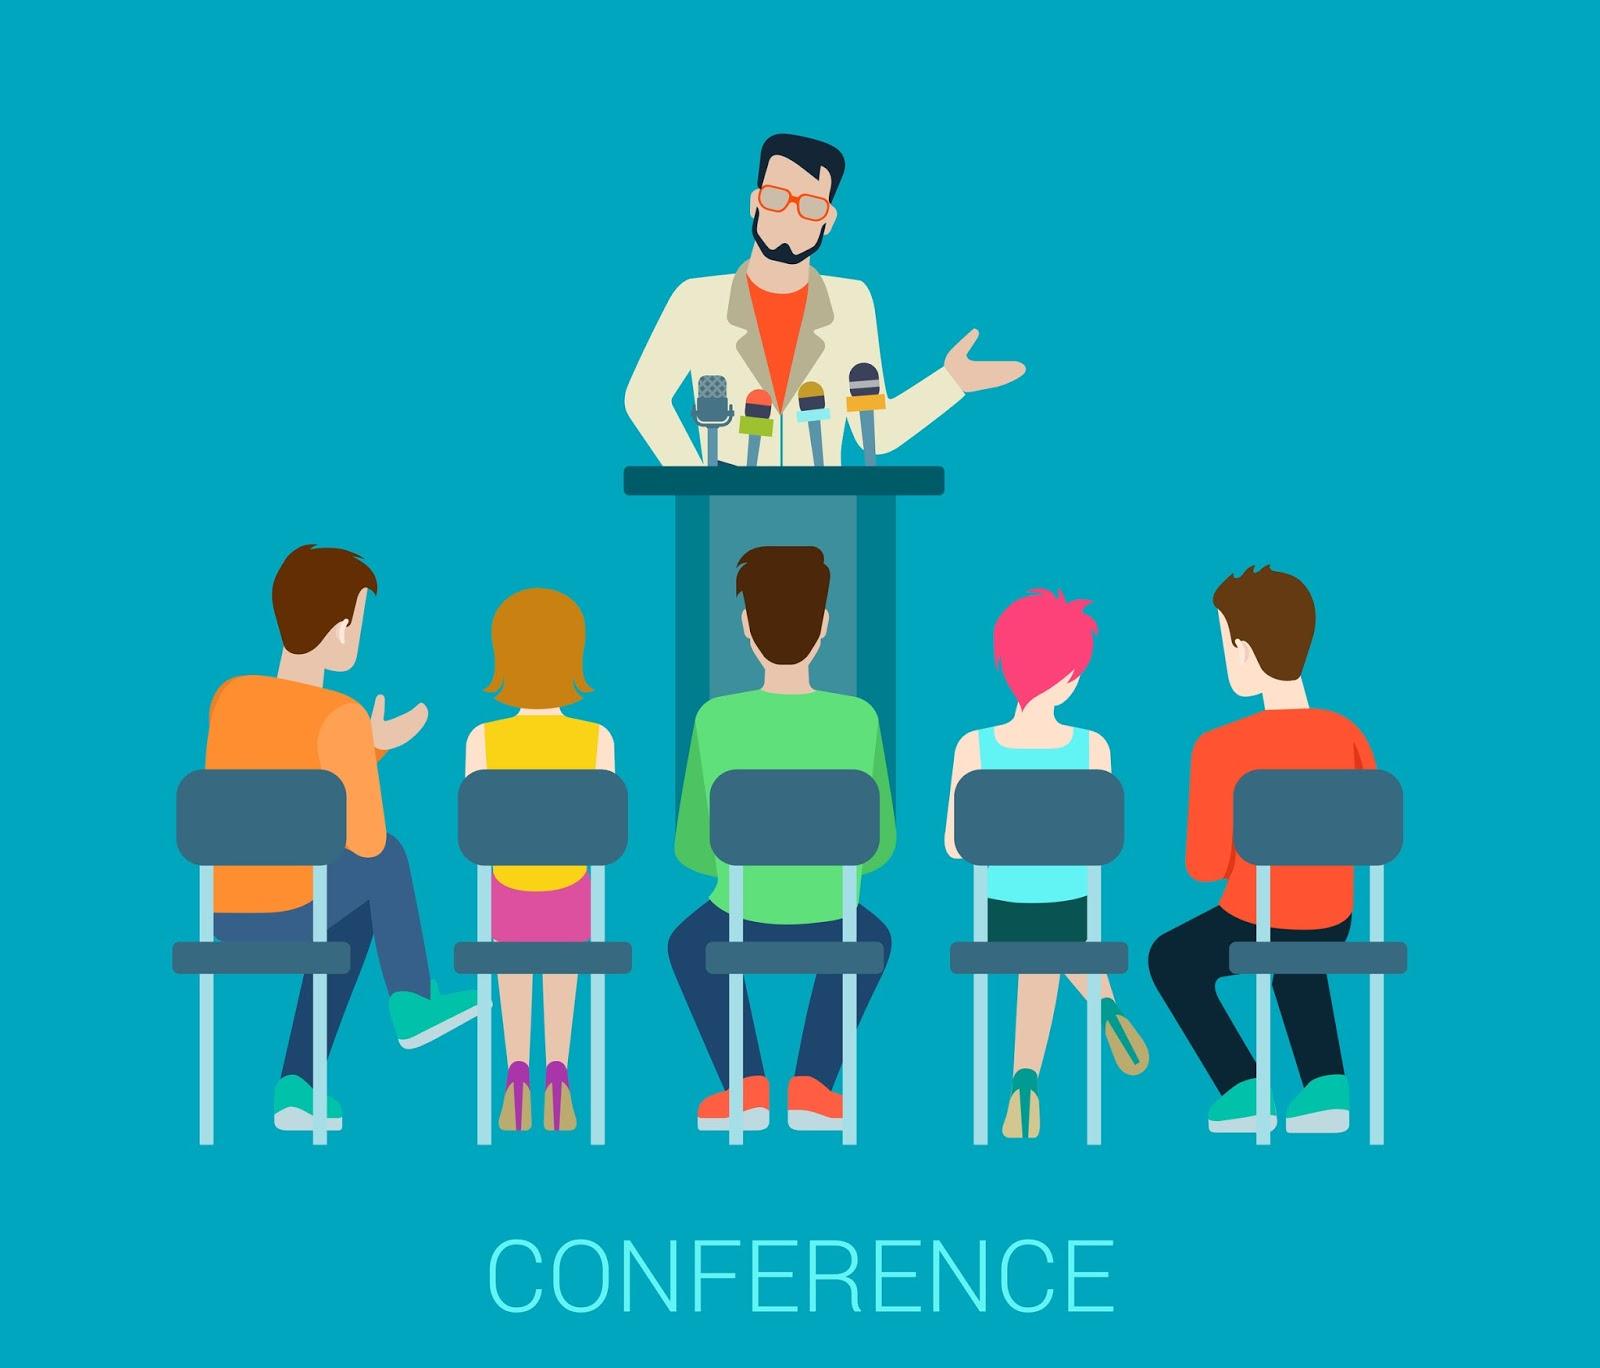 edtech advantage conference confessions